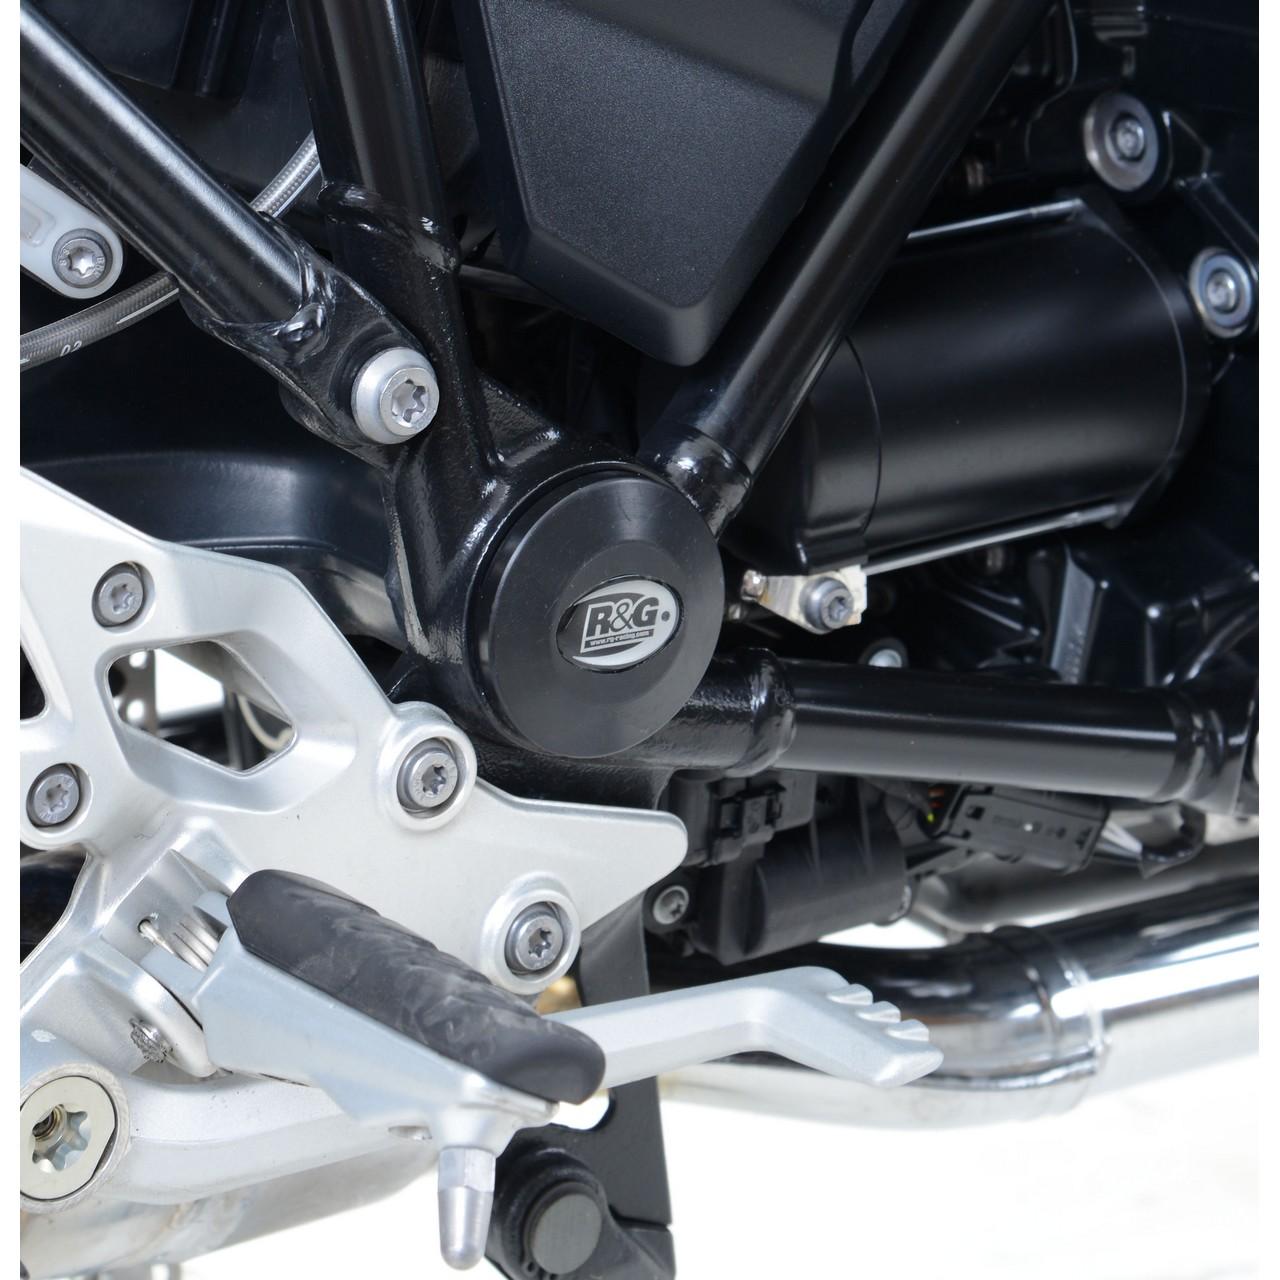 【R&G】車台塞蓋套件【Frame Plug Kit】■